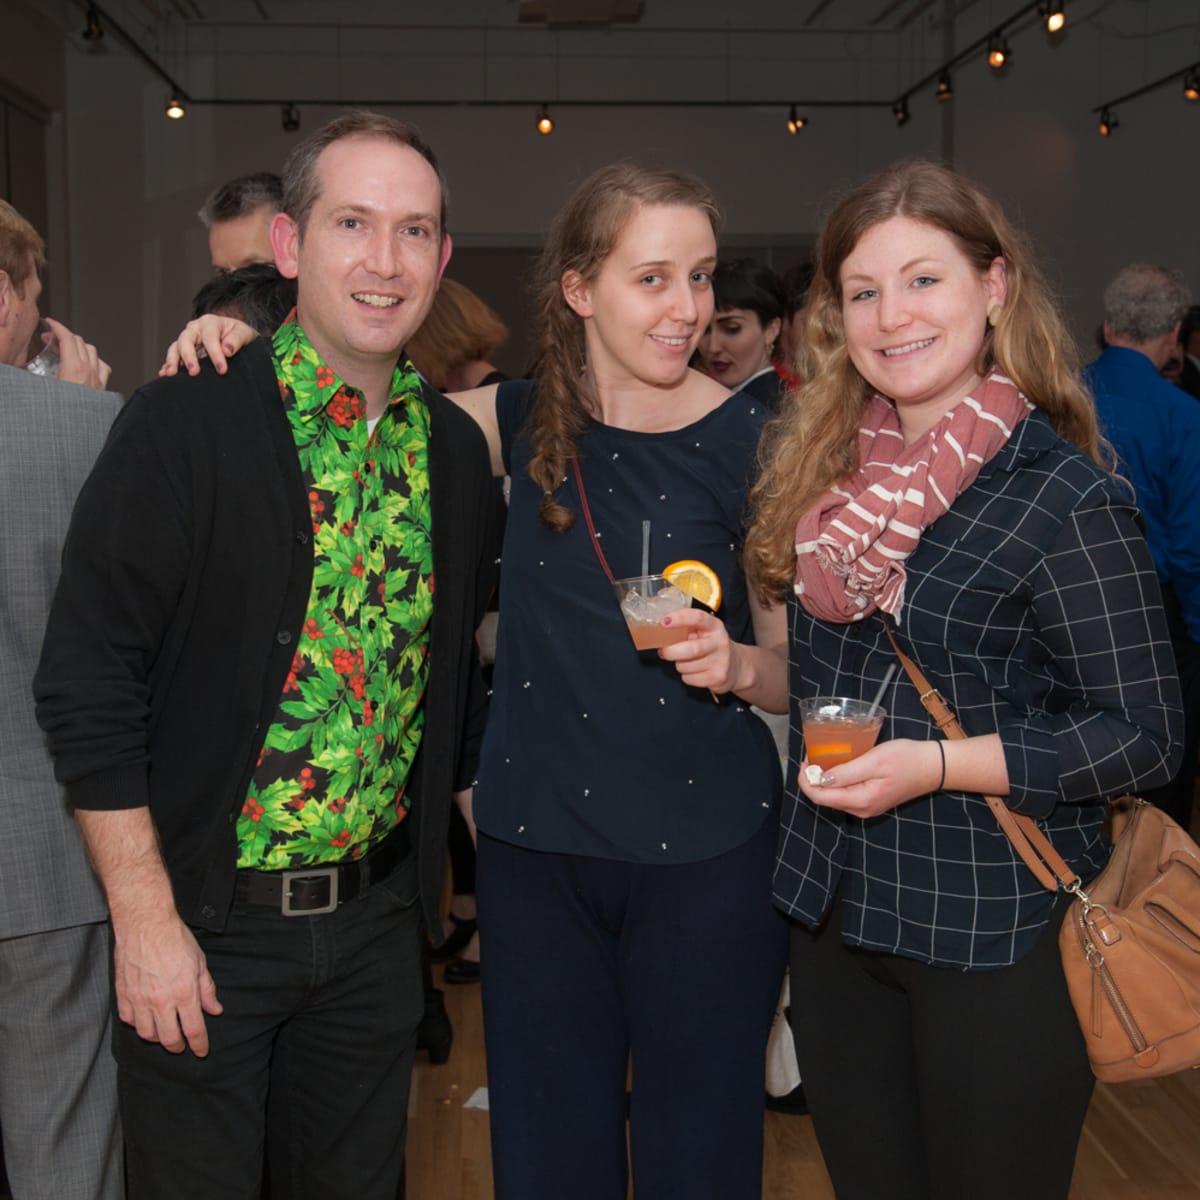 News, DiverseWorks MATCH party, Dec. 2015 Dennis Nance, Sarah Darro, Hayley McSwain